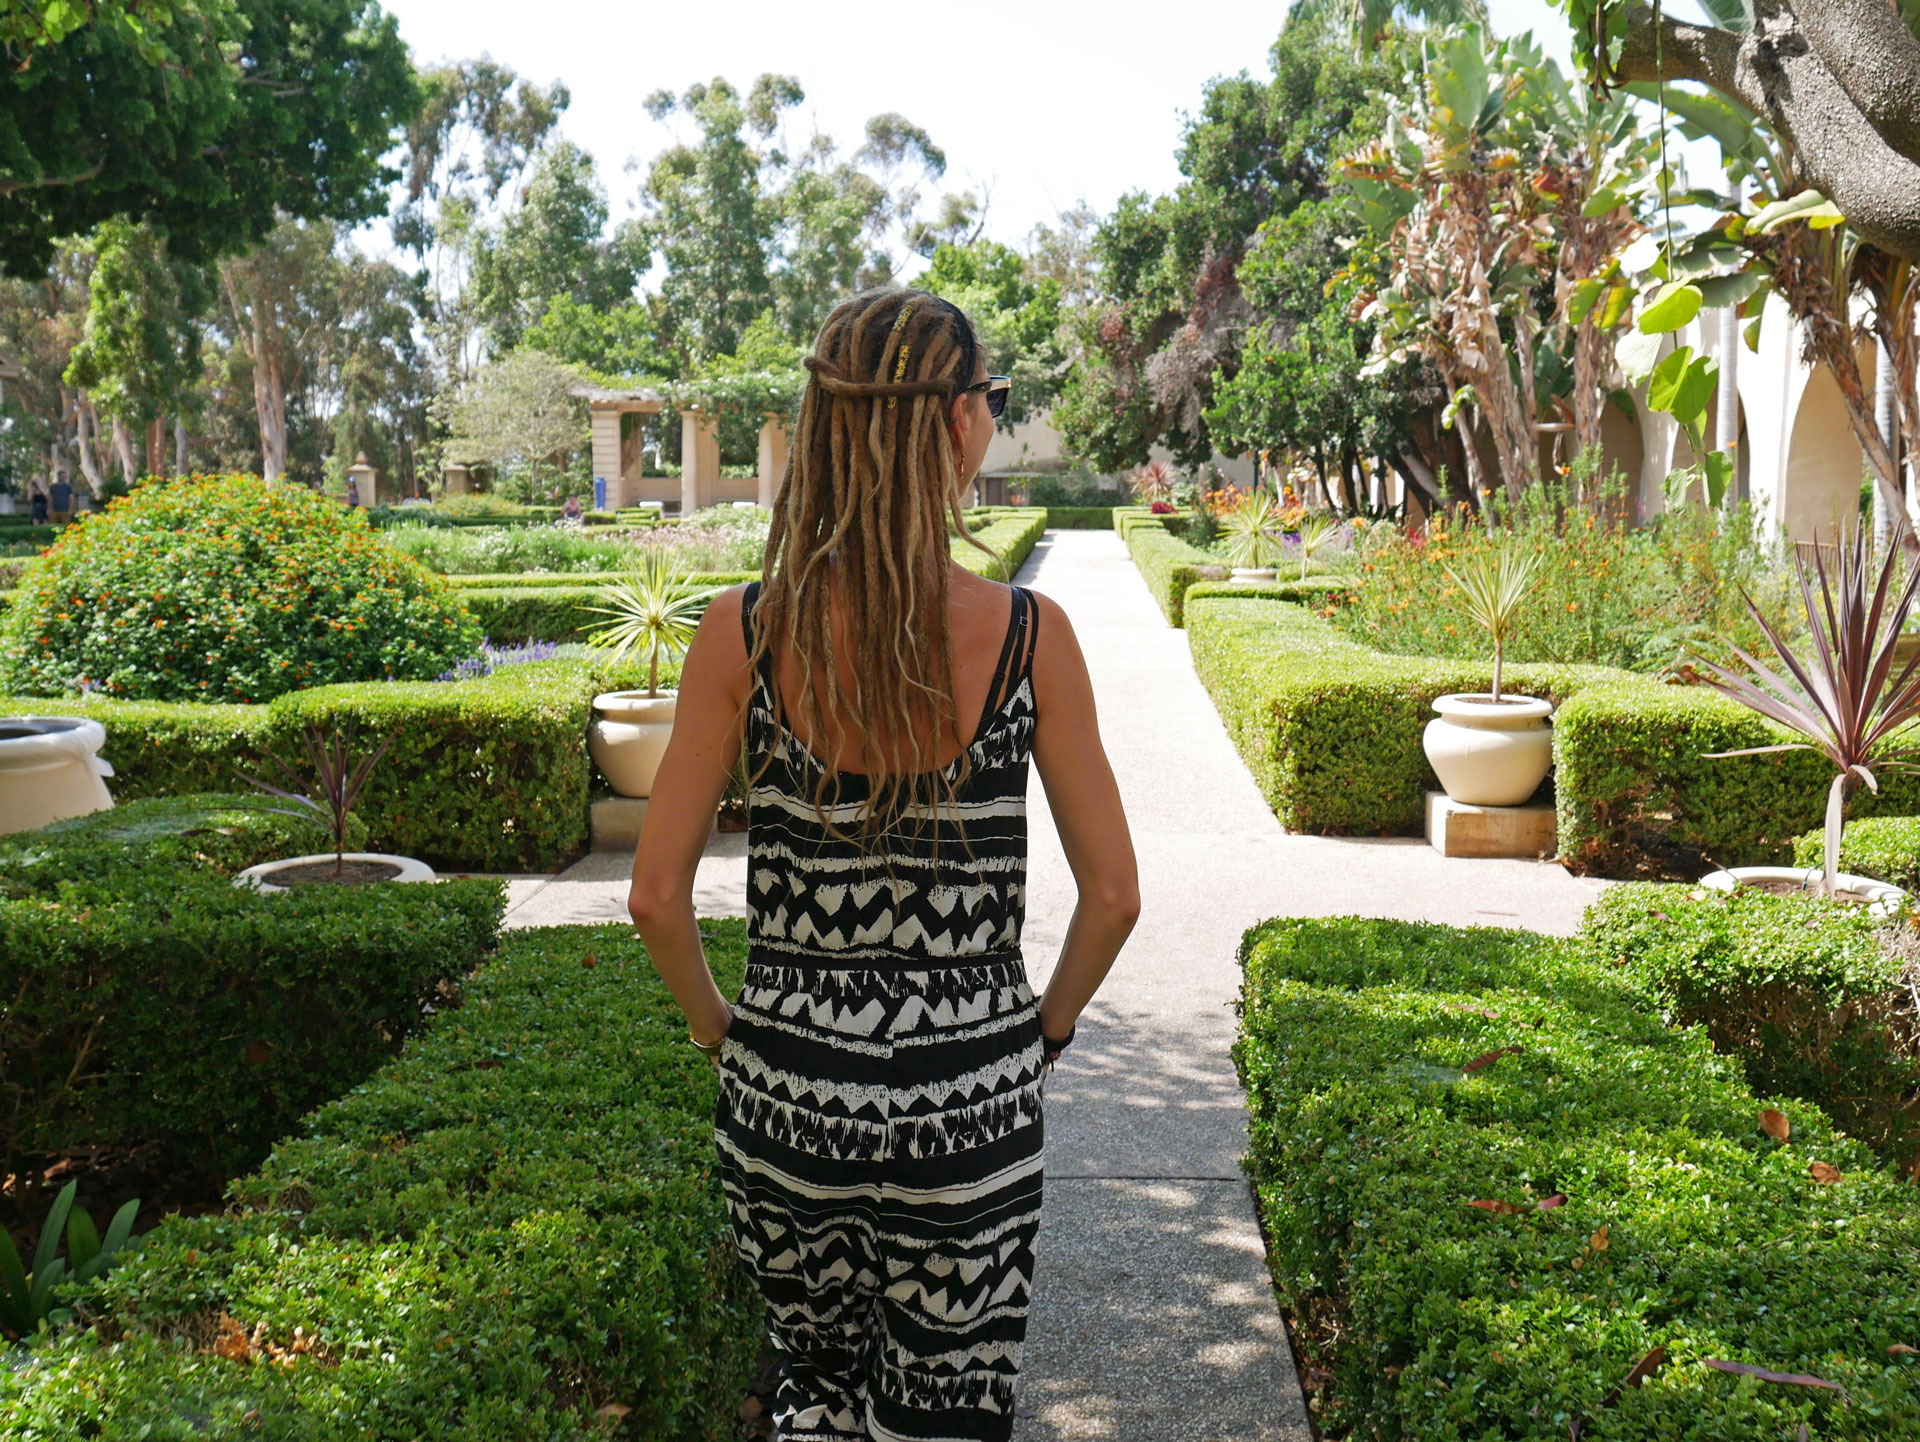 Rasta girl walking around Balboa Park in San Diego, CA